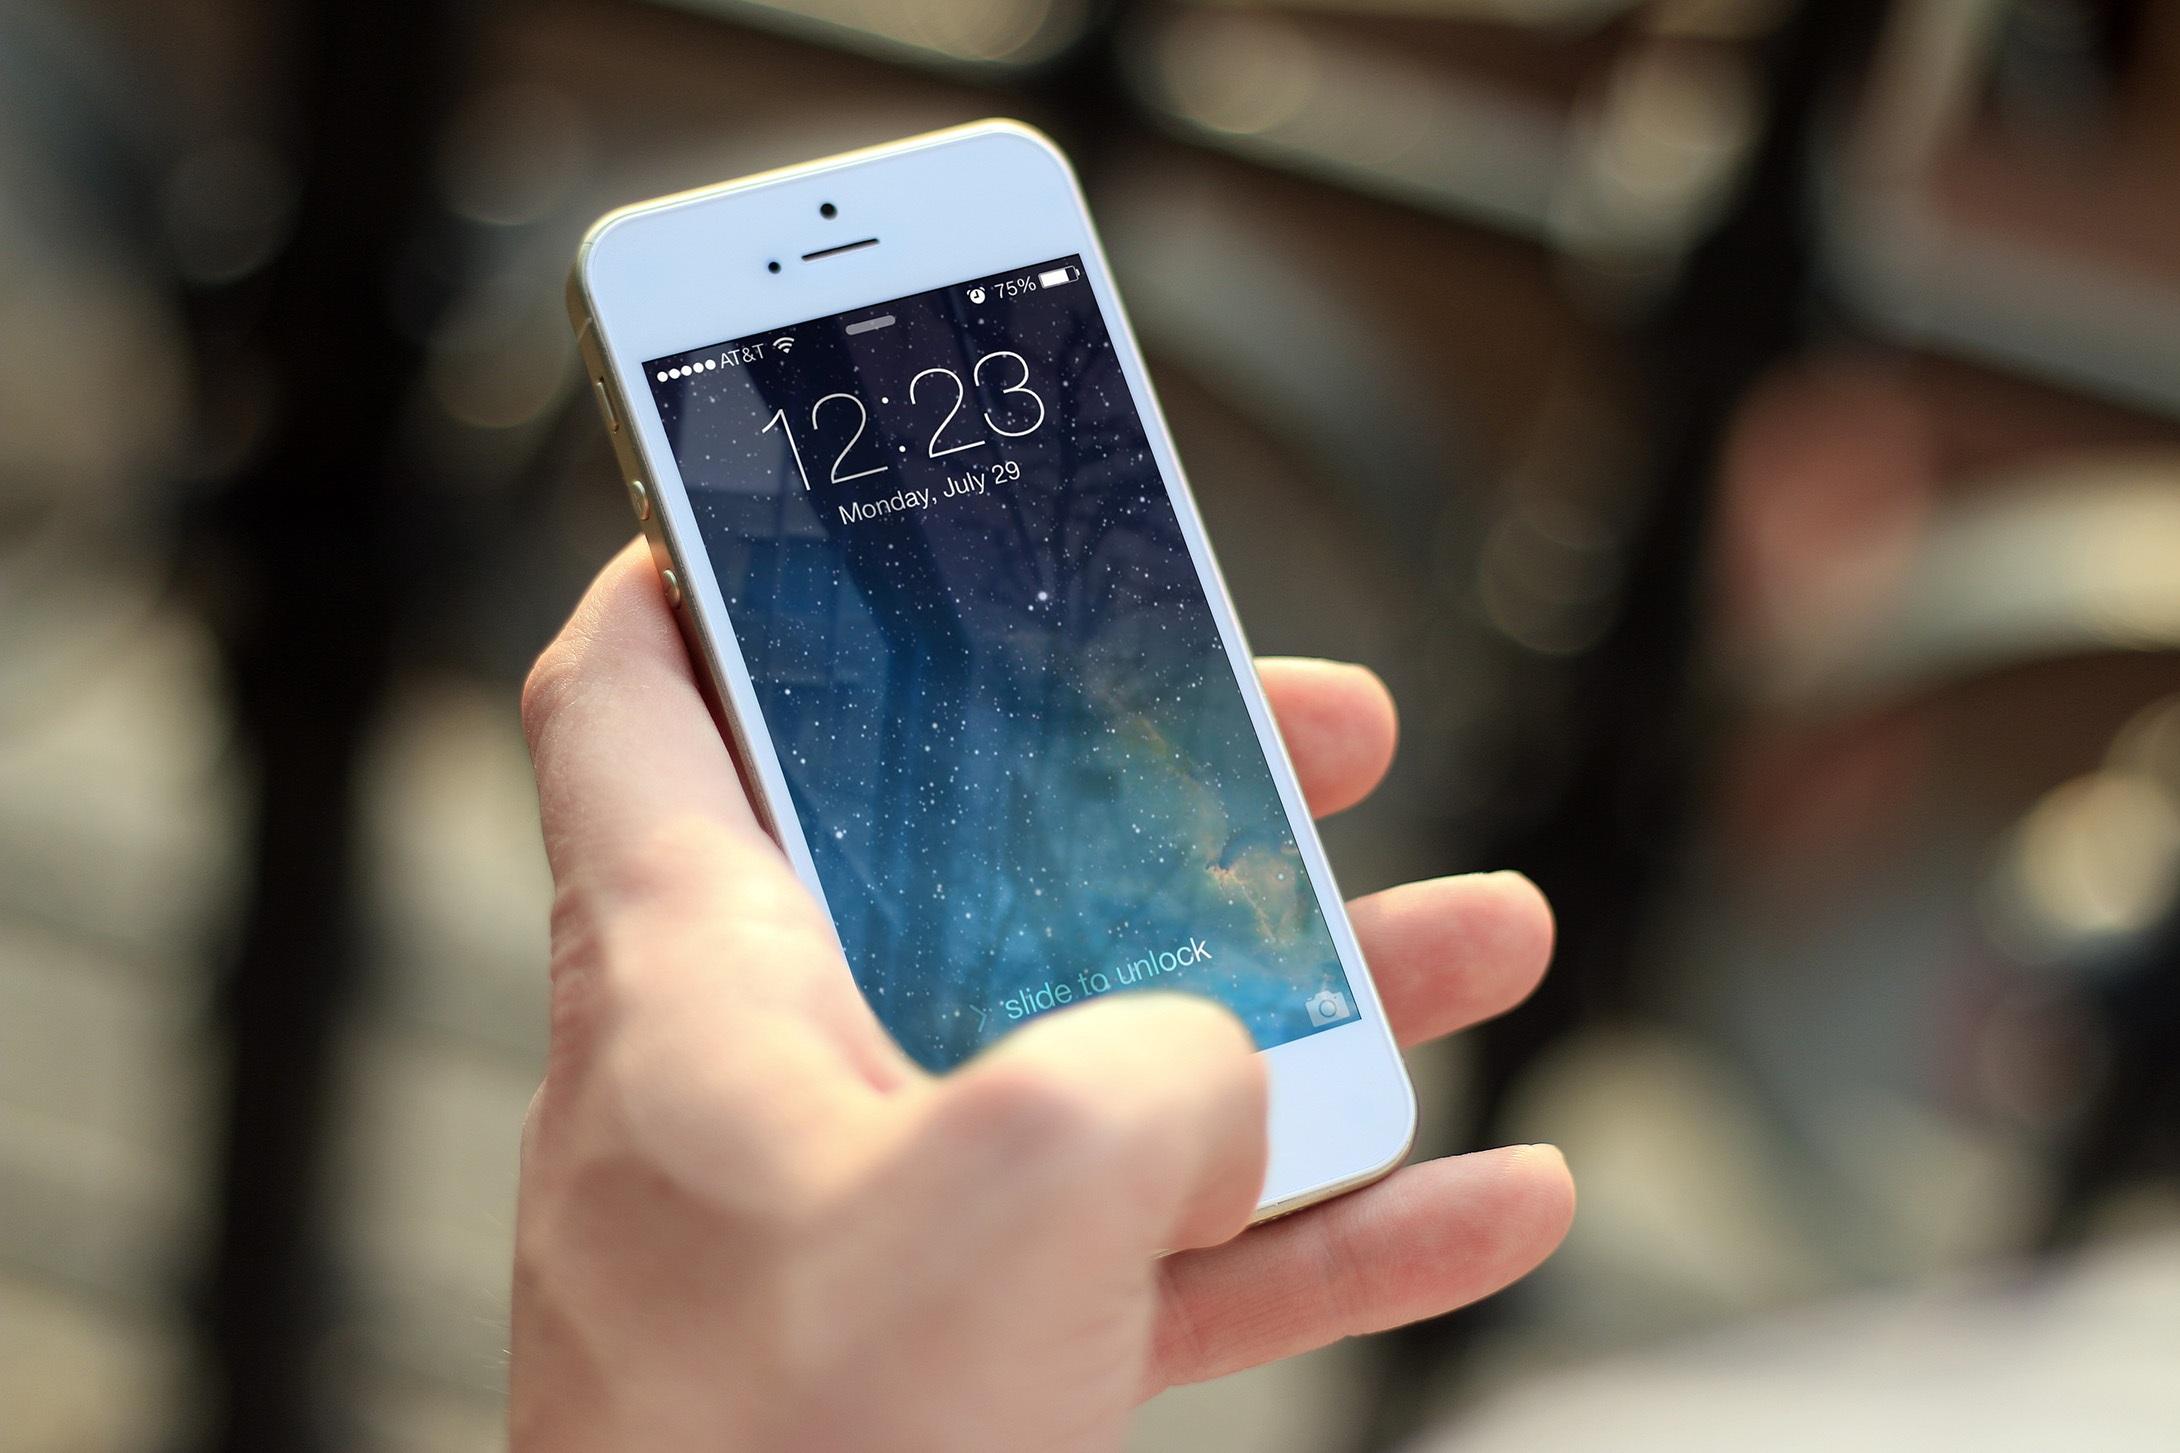 iphone-smartphone-apps-apple-inc-40011.jpeg